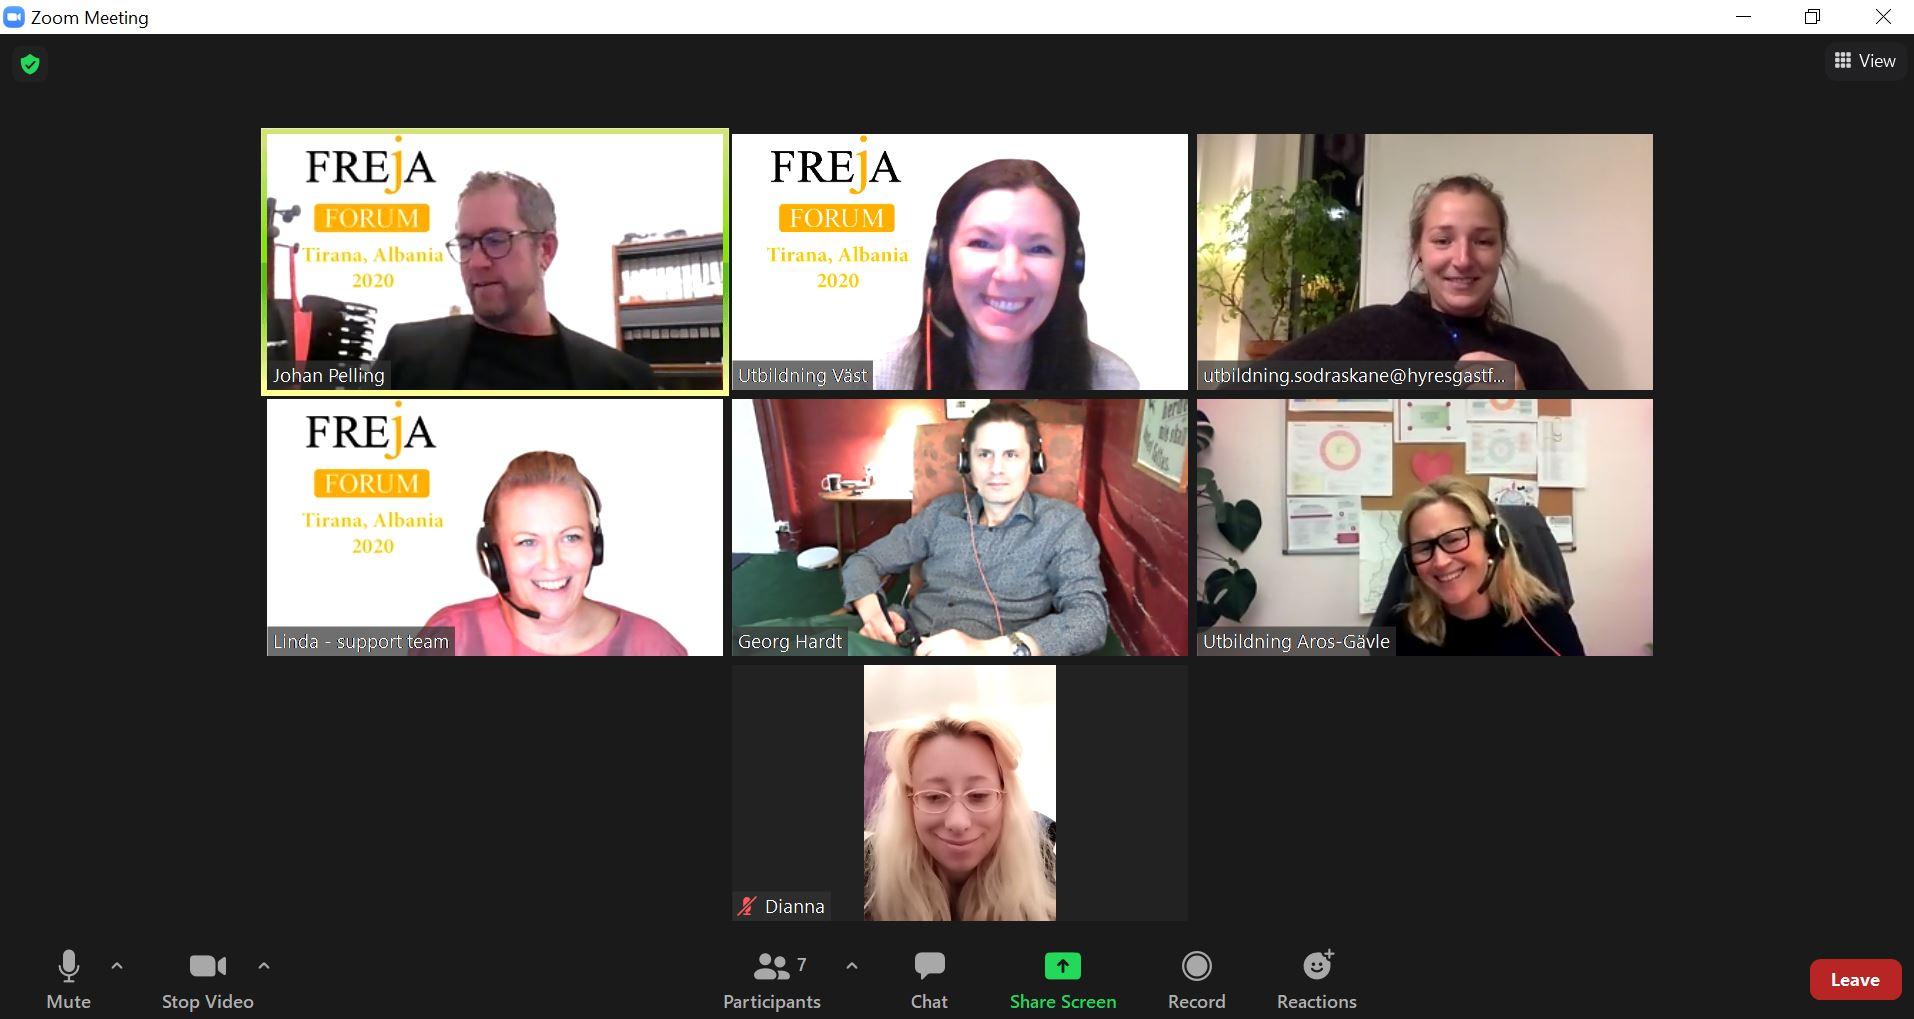 7 people on screen in digital meeting, all laughing, in their homes.